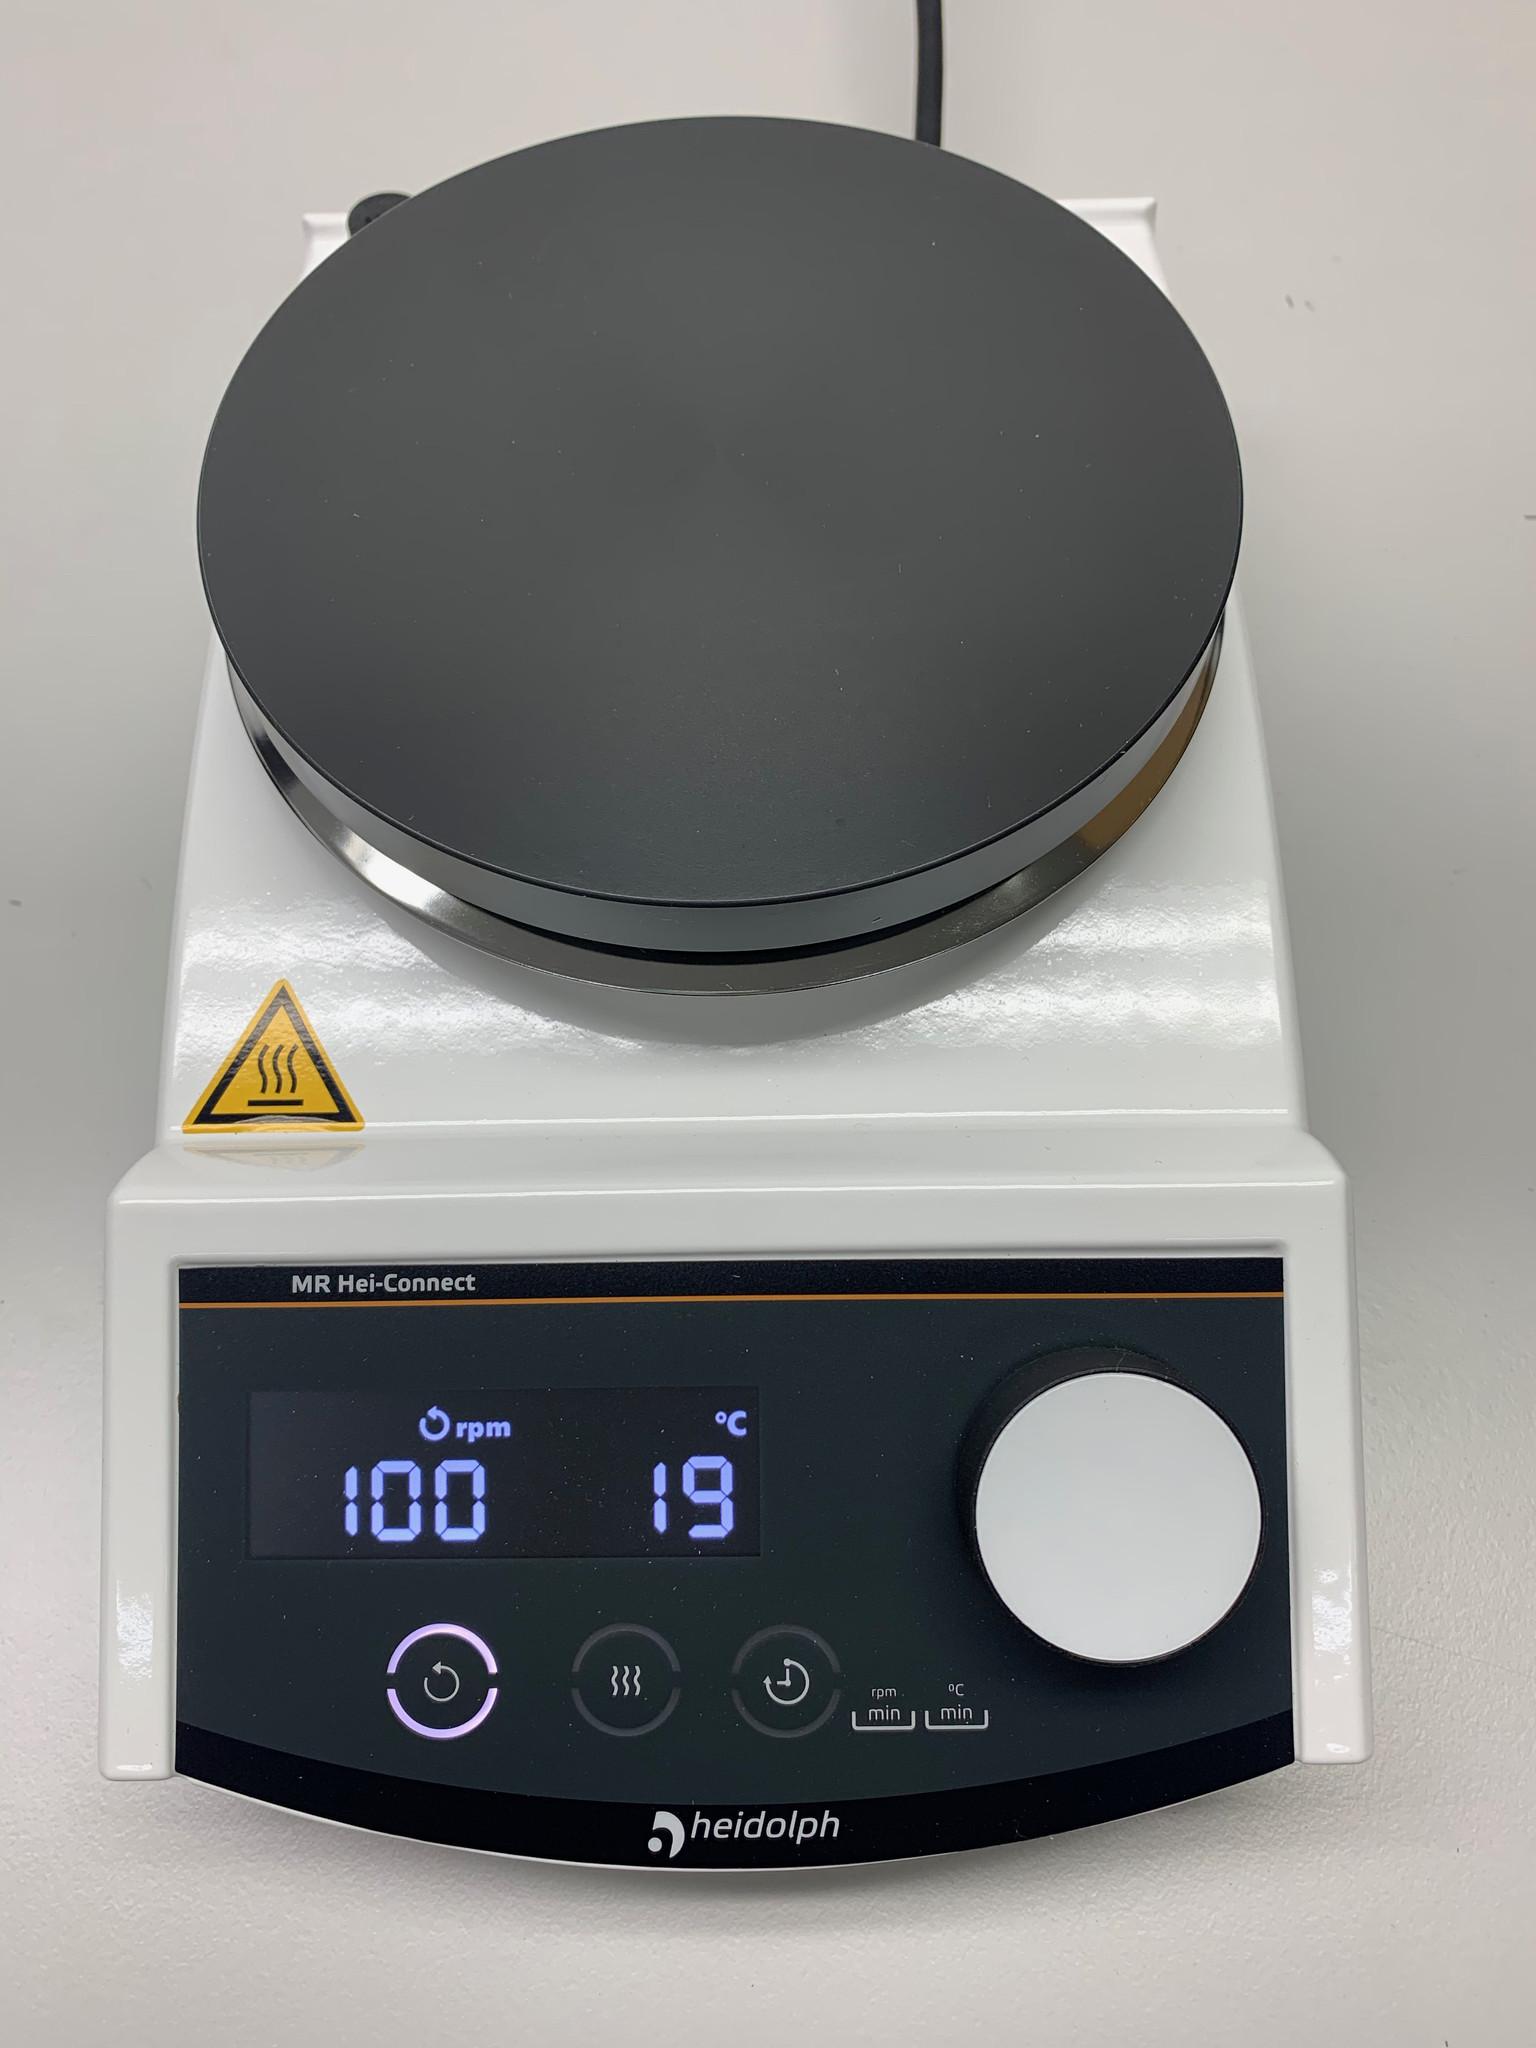 Heidolph Heidolph Hei-Connect Magnetic Stirrer